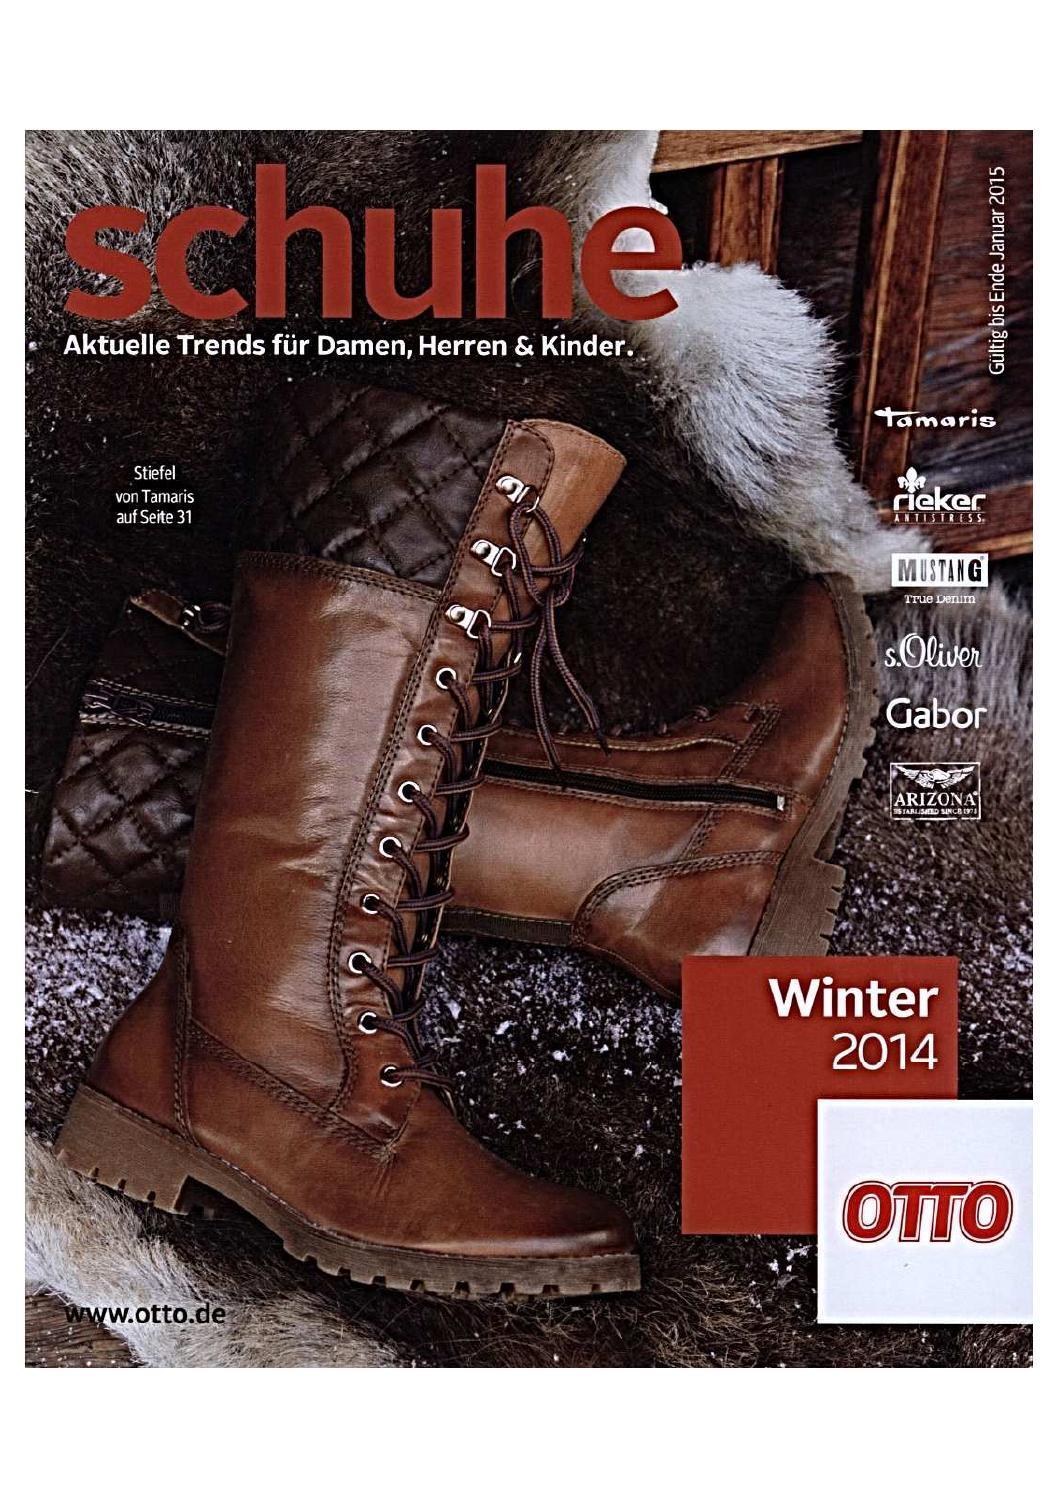 new concept dc9c3 0df4f Каталог otto schuhe осень зима 201415 by Prestige - issuu